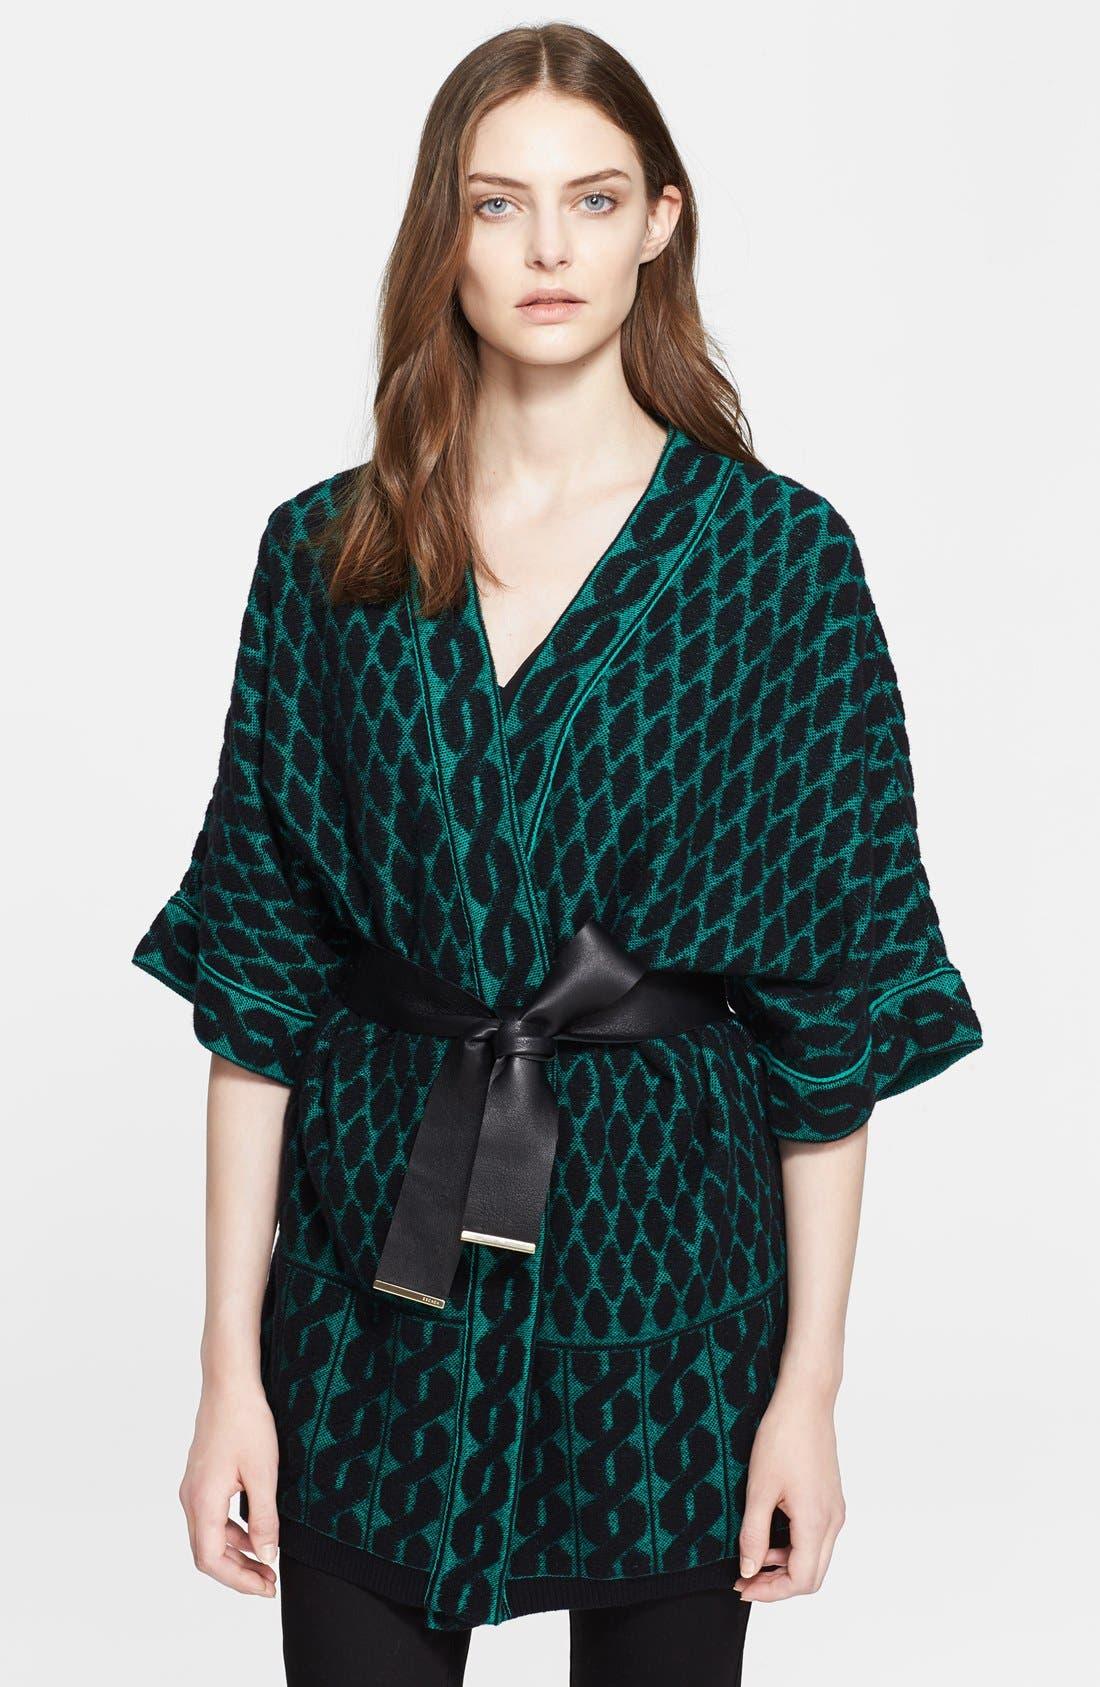 Main Image - ESCADA Leather Belted Jacquard Knit Cardigan